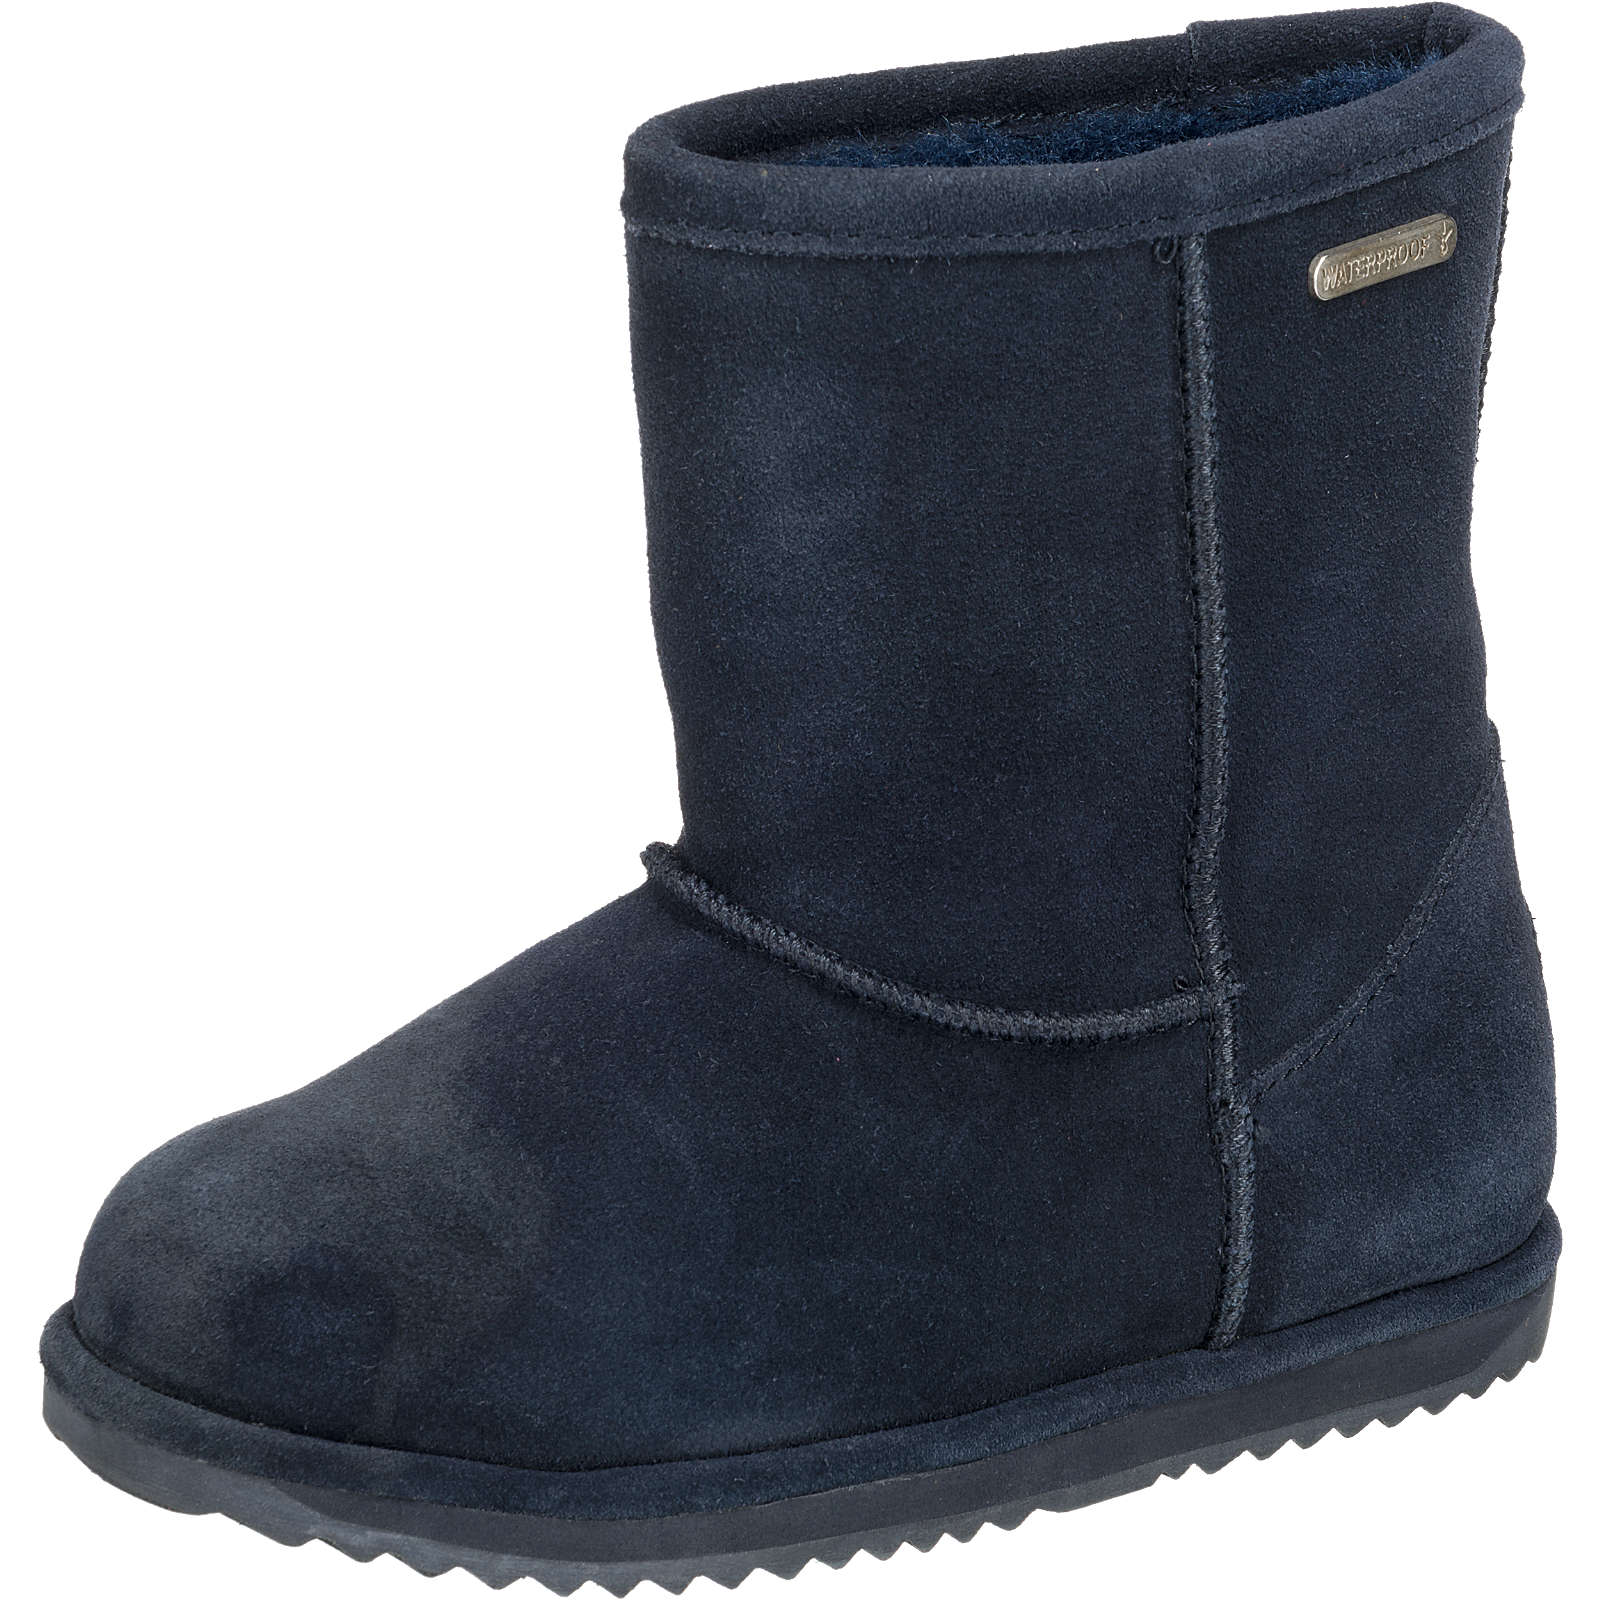 EMU Australia Kinder Winterstiefel Brumby Lo, waterproof dunkelblau Gr. 32 jetztbilligerkaufen